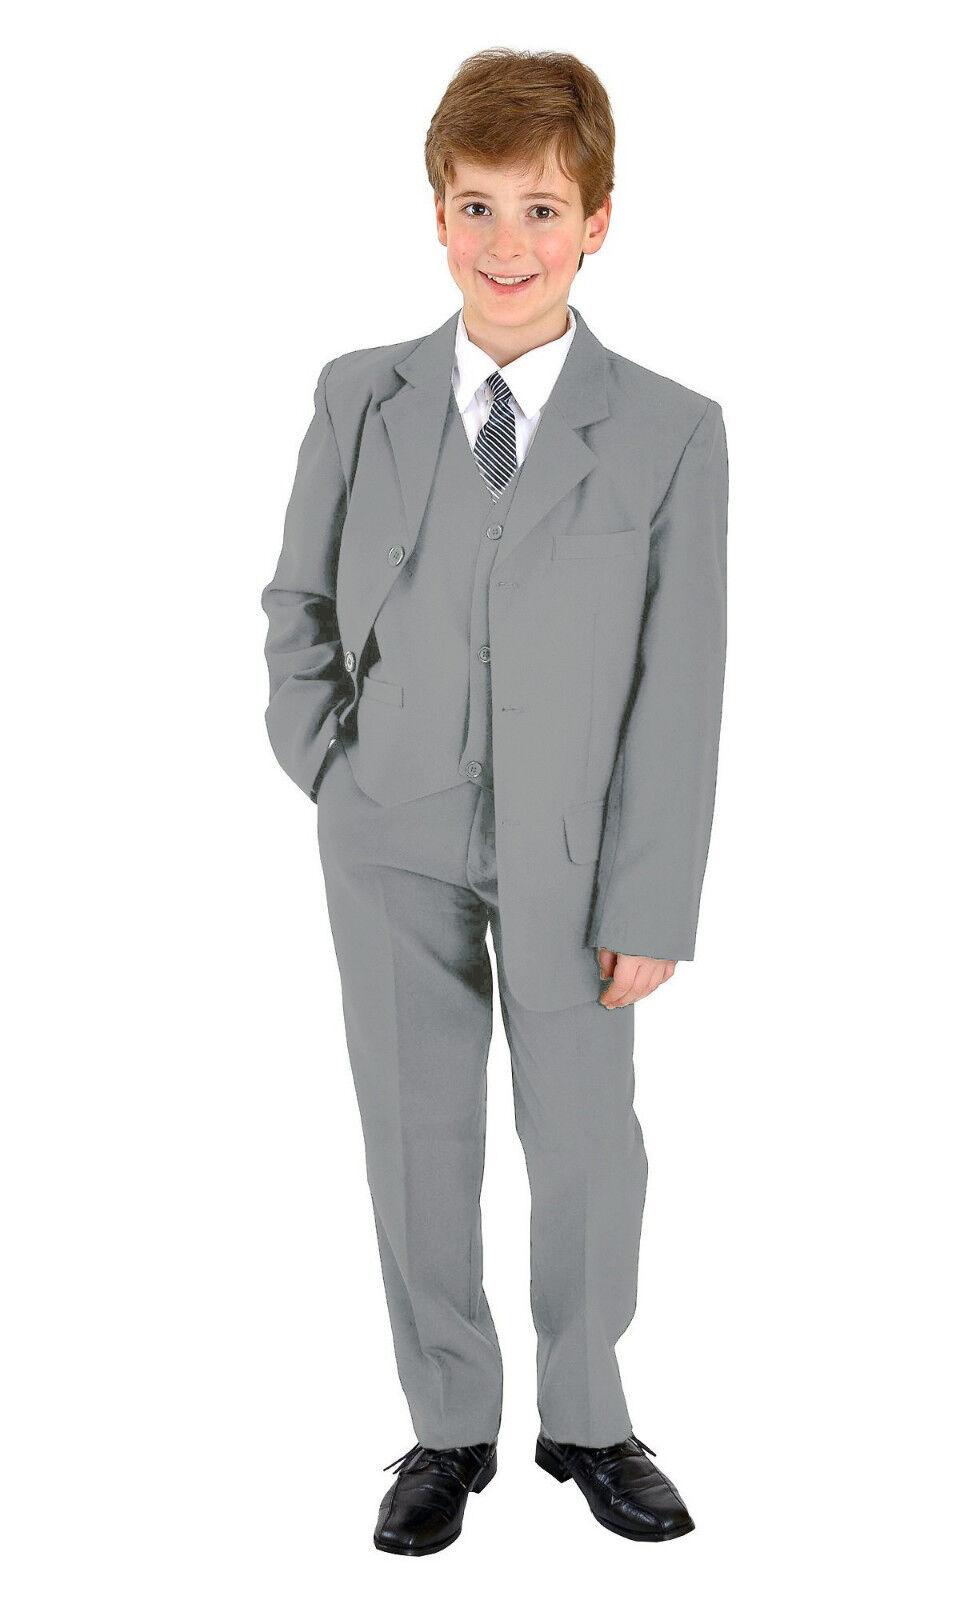 5 teiliger Jungenanzug Kinderanzug Kommunionsanzug Anzug Taufanzug uni hellgrau